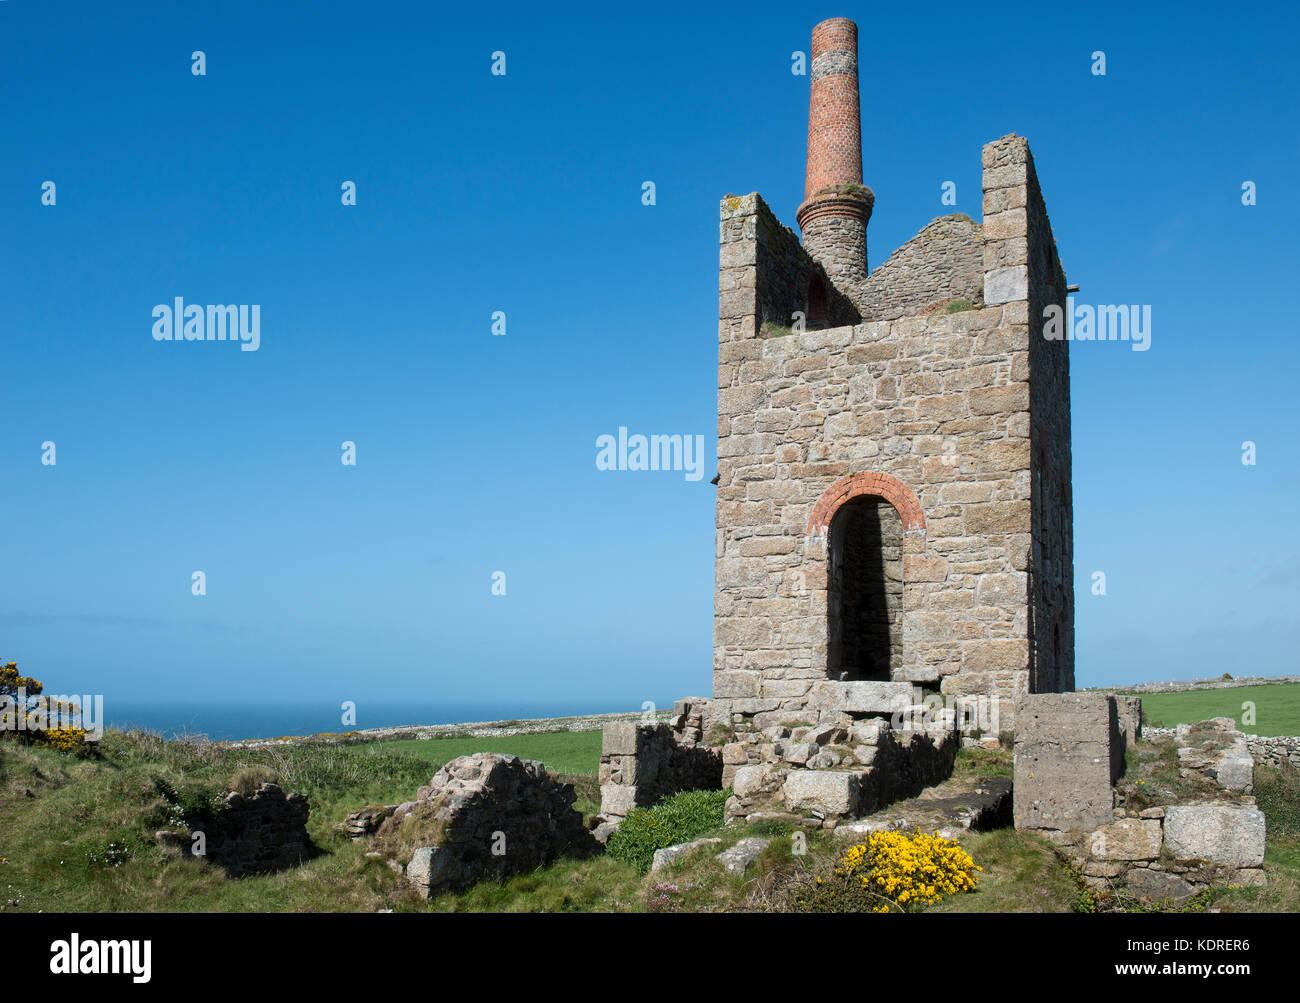 Old tin mine workings in Cornwall, England, UK - Stock Image